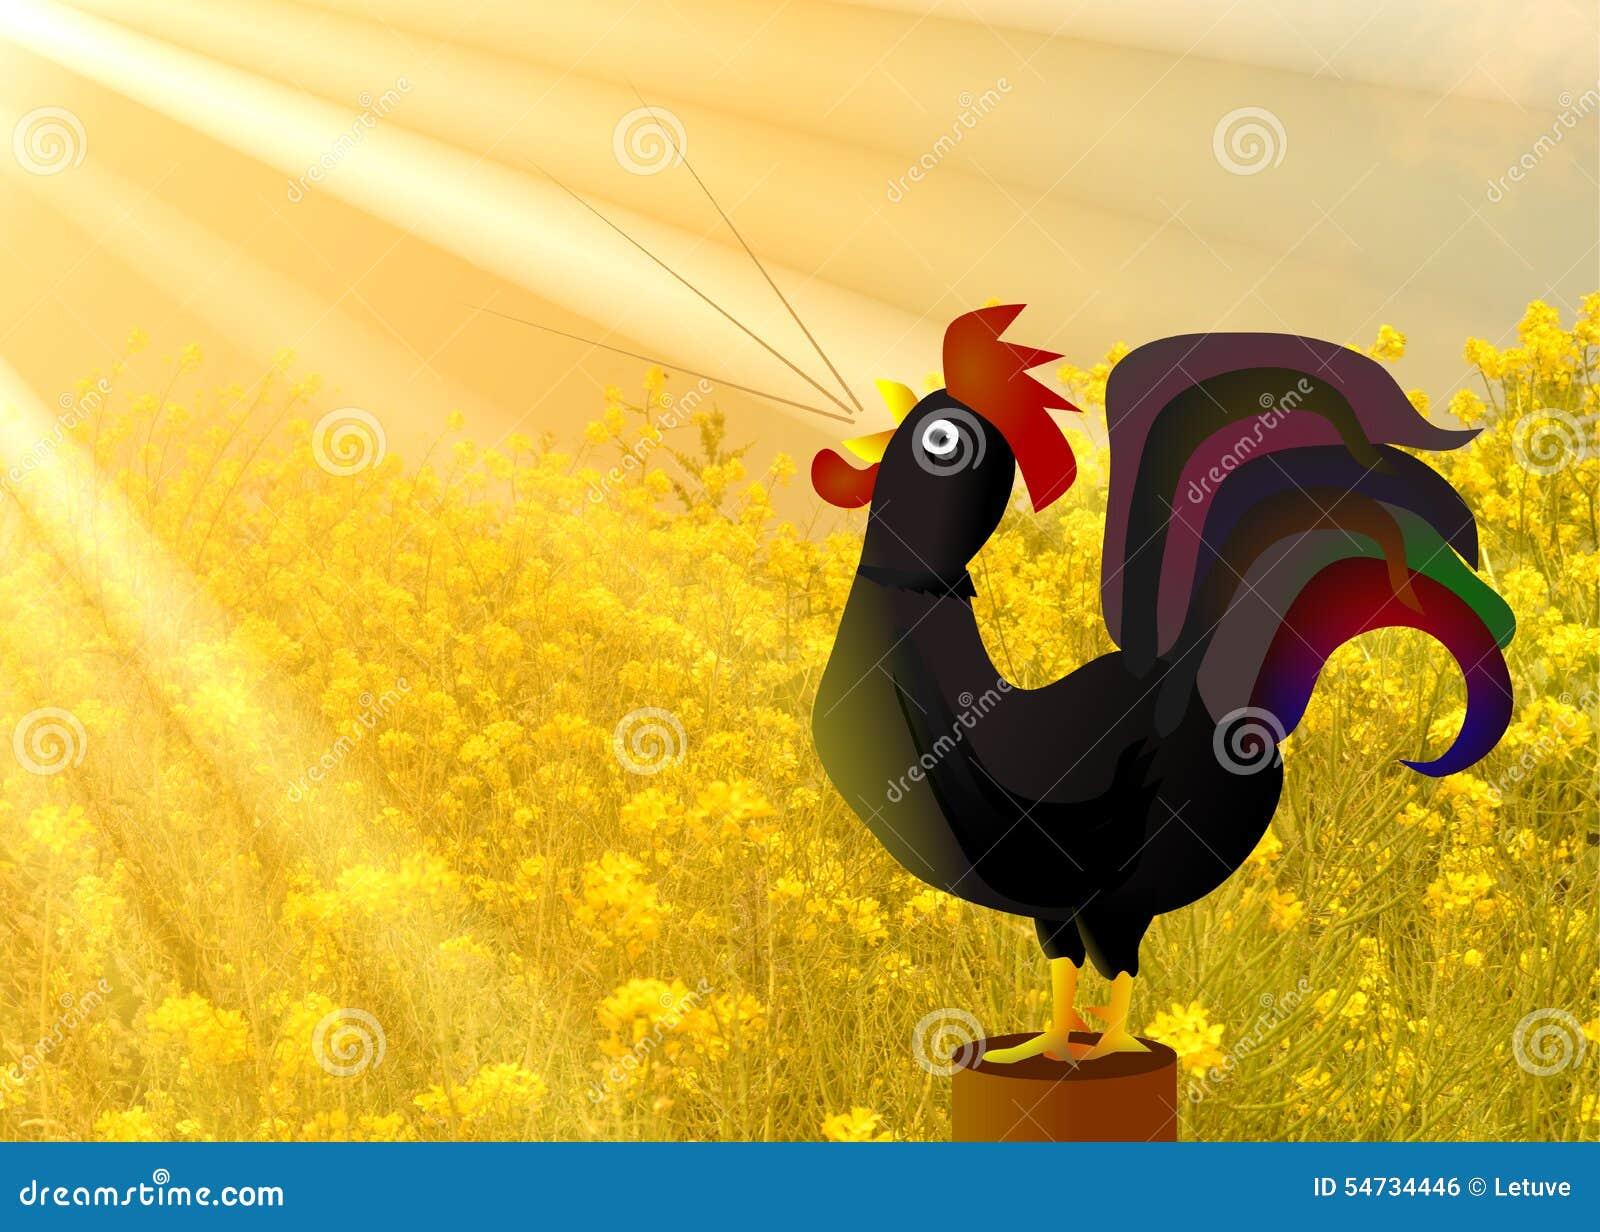 Crowing rooster golden sunshine morning